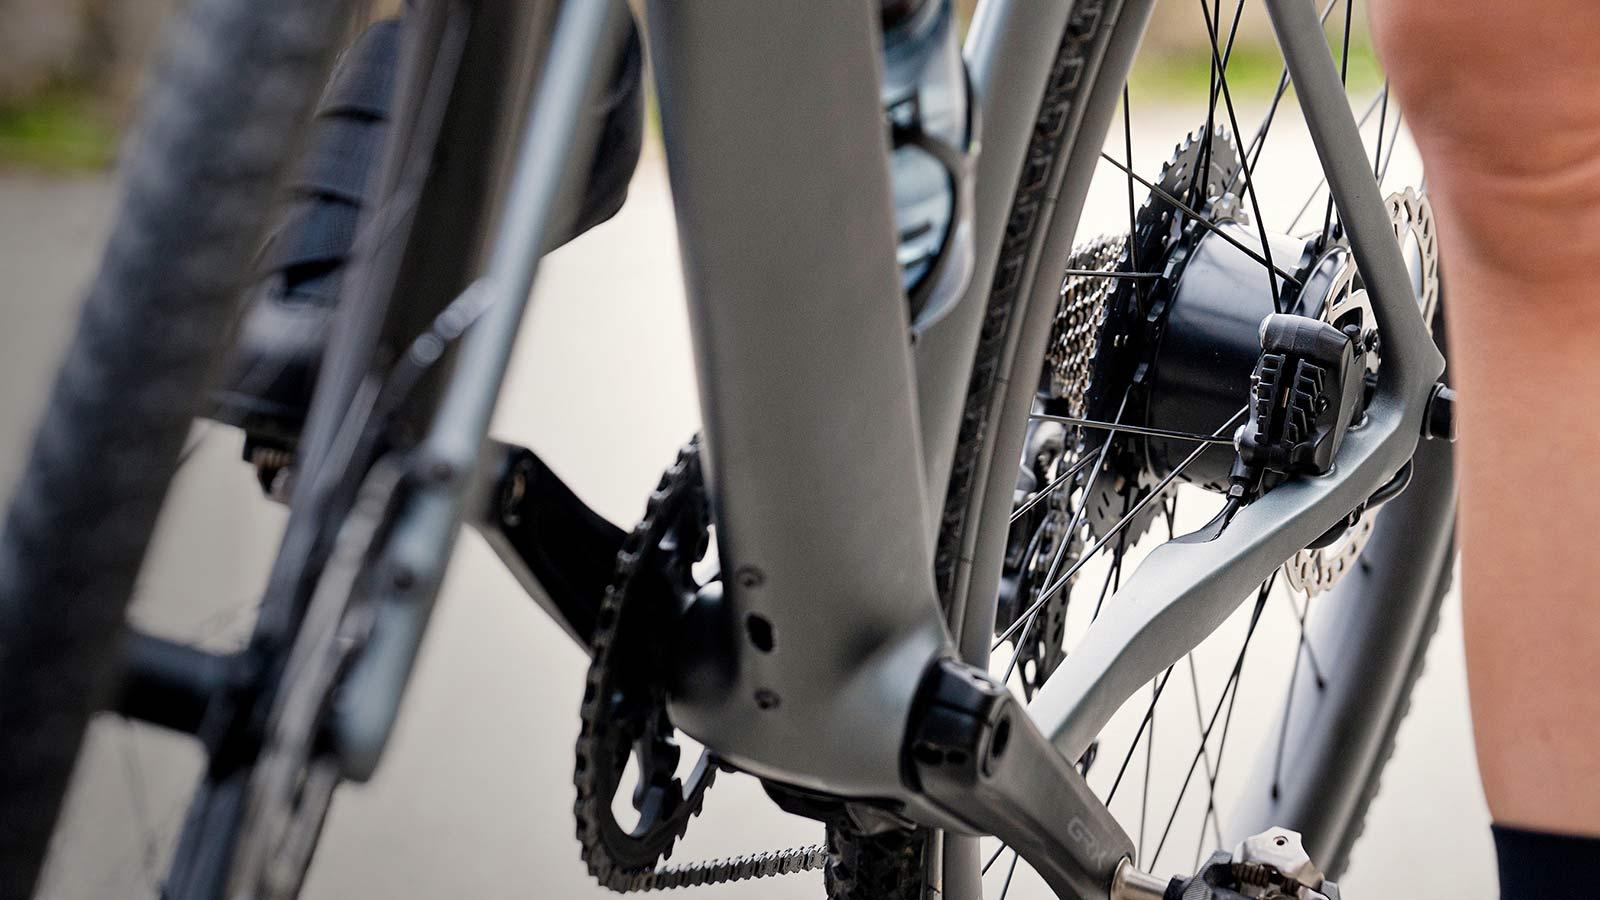 3T Exploro RaceMax Boost gravel e-bike, stealth ebikemotion X35 pedal-assist system